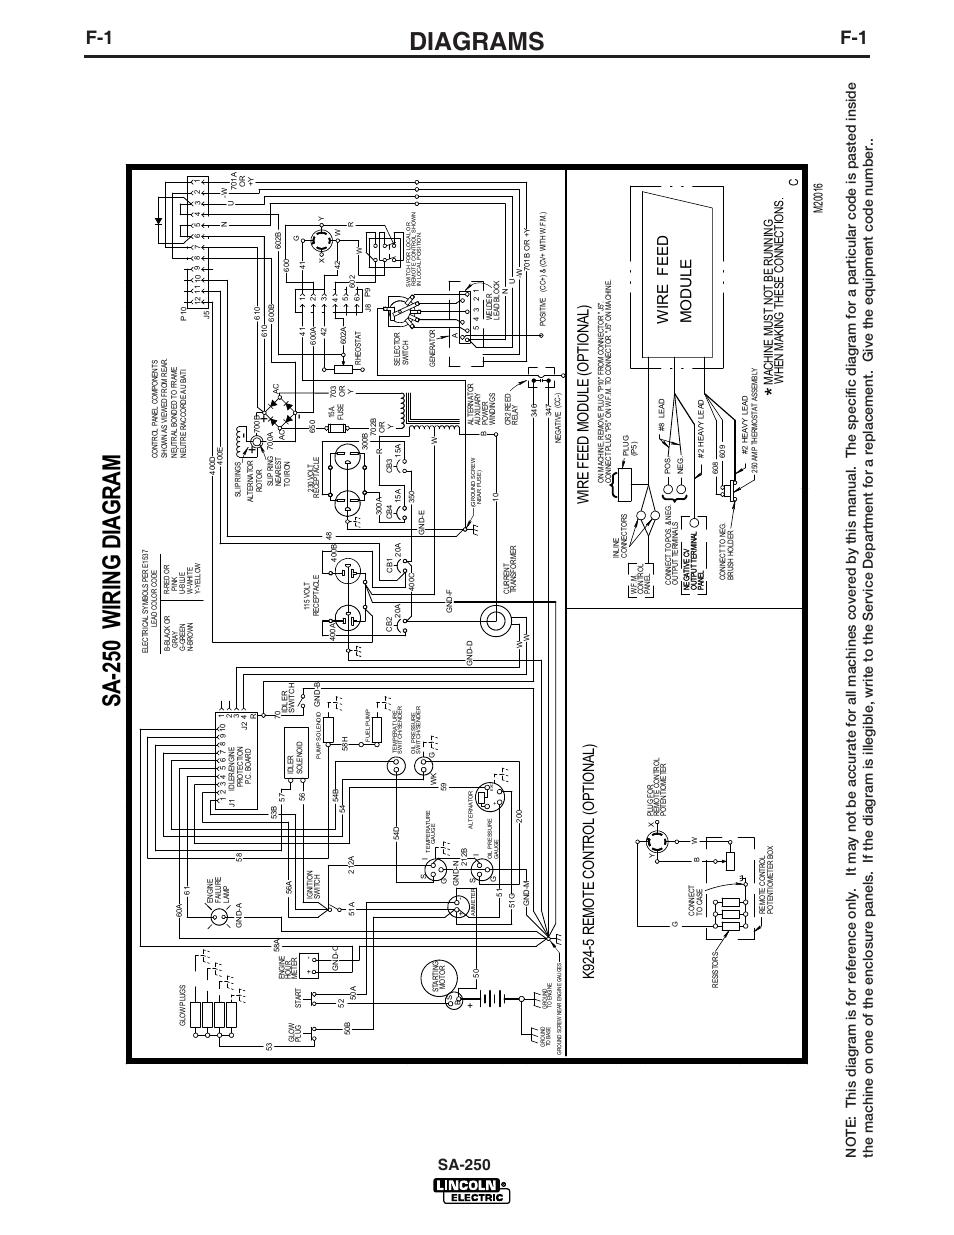 diagrams sa 25 0 w iri ng di agram sa 250 lincoln electric sa rh manualsdir com